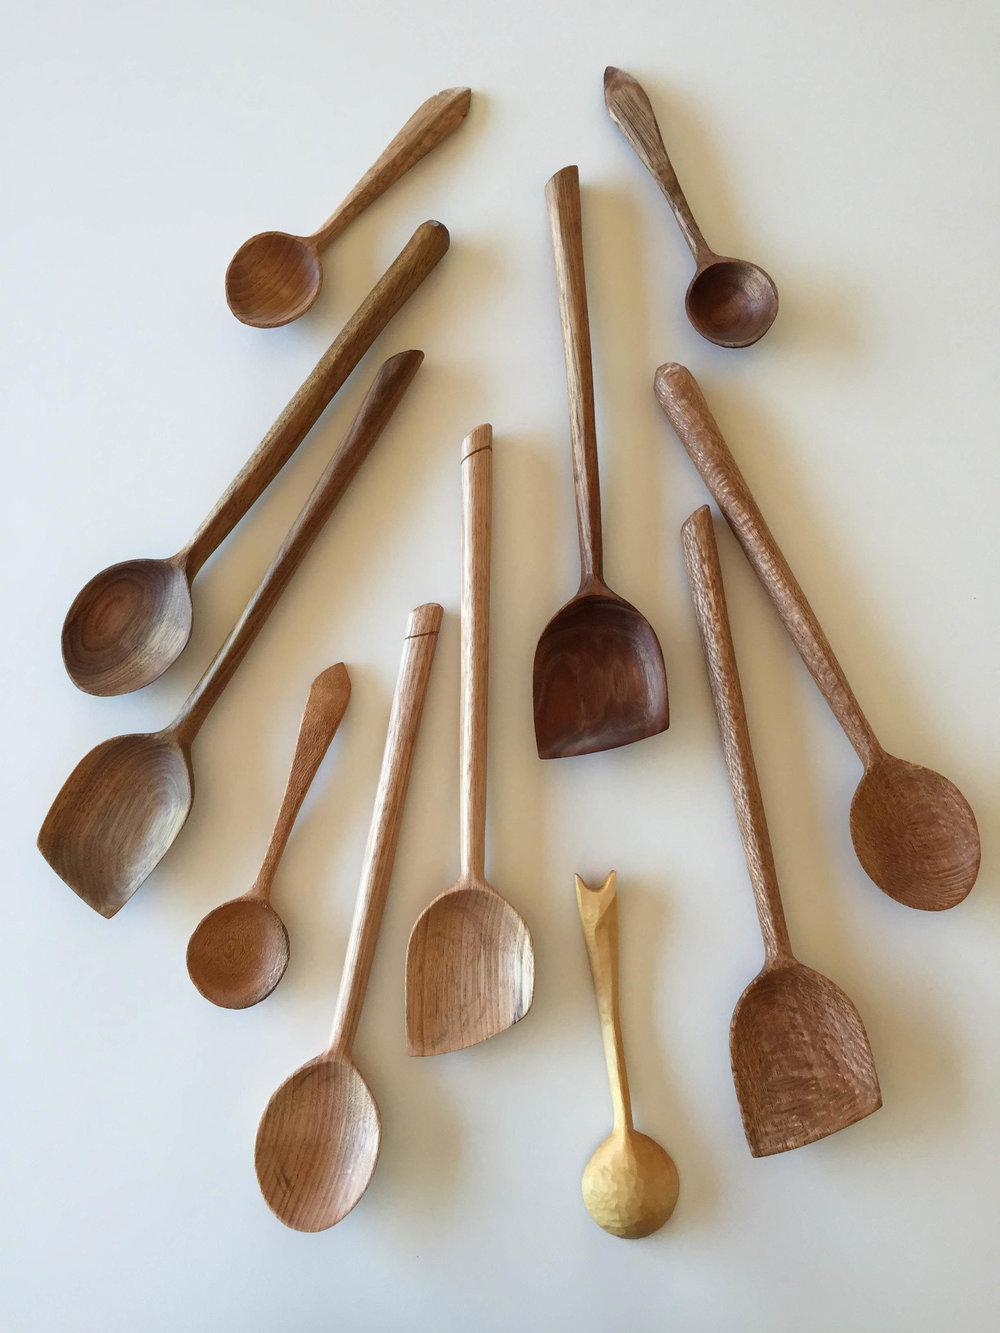 Many spoons.jpg